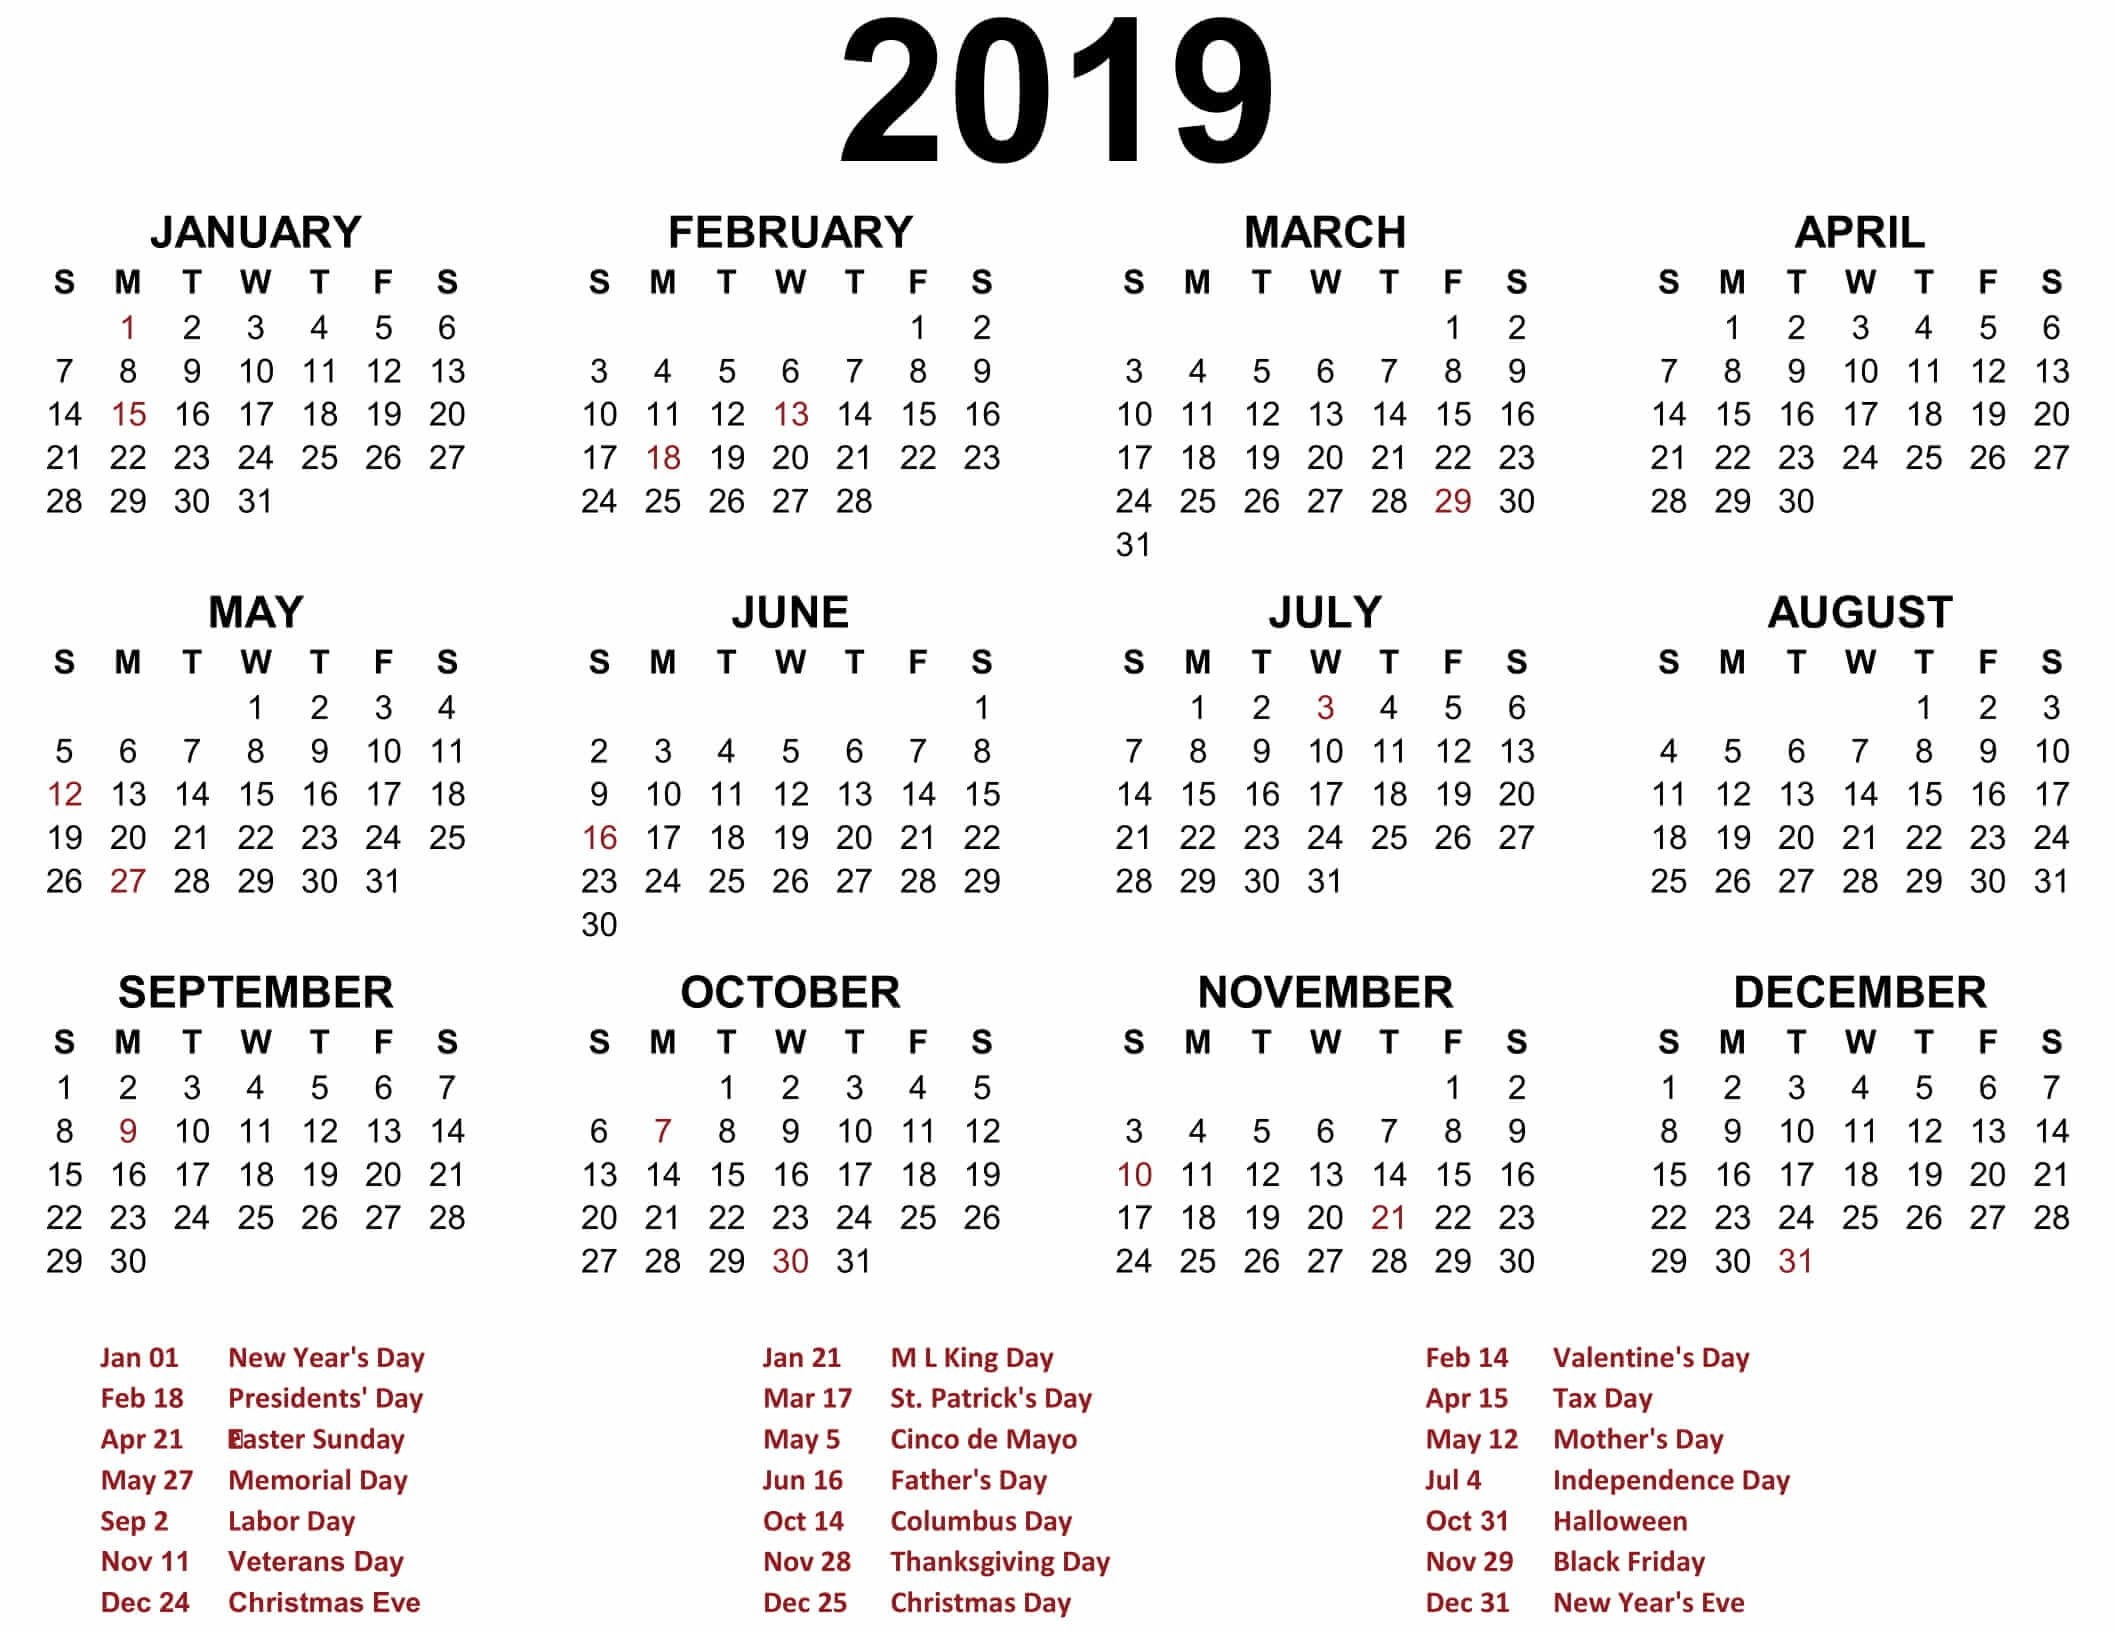 Printable Blank 2019 Calendar Templates – Calenndar Images Of A 2019 Calendar